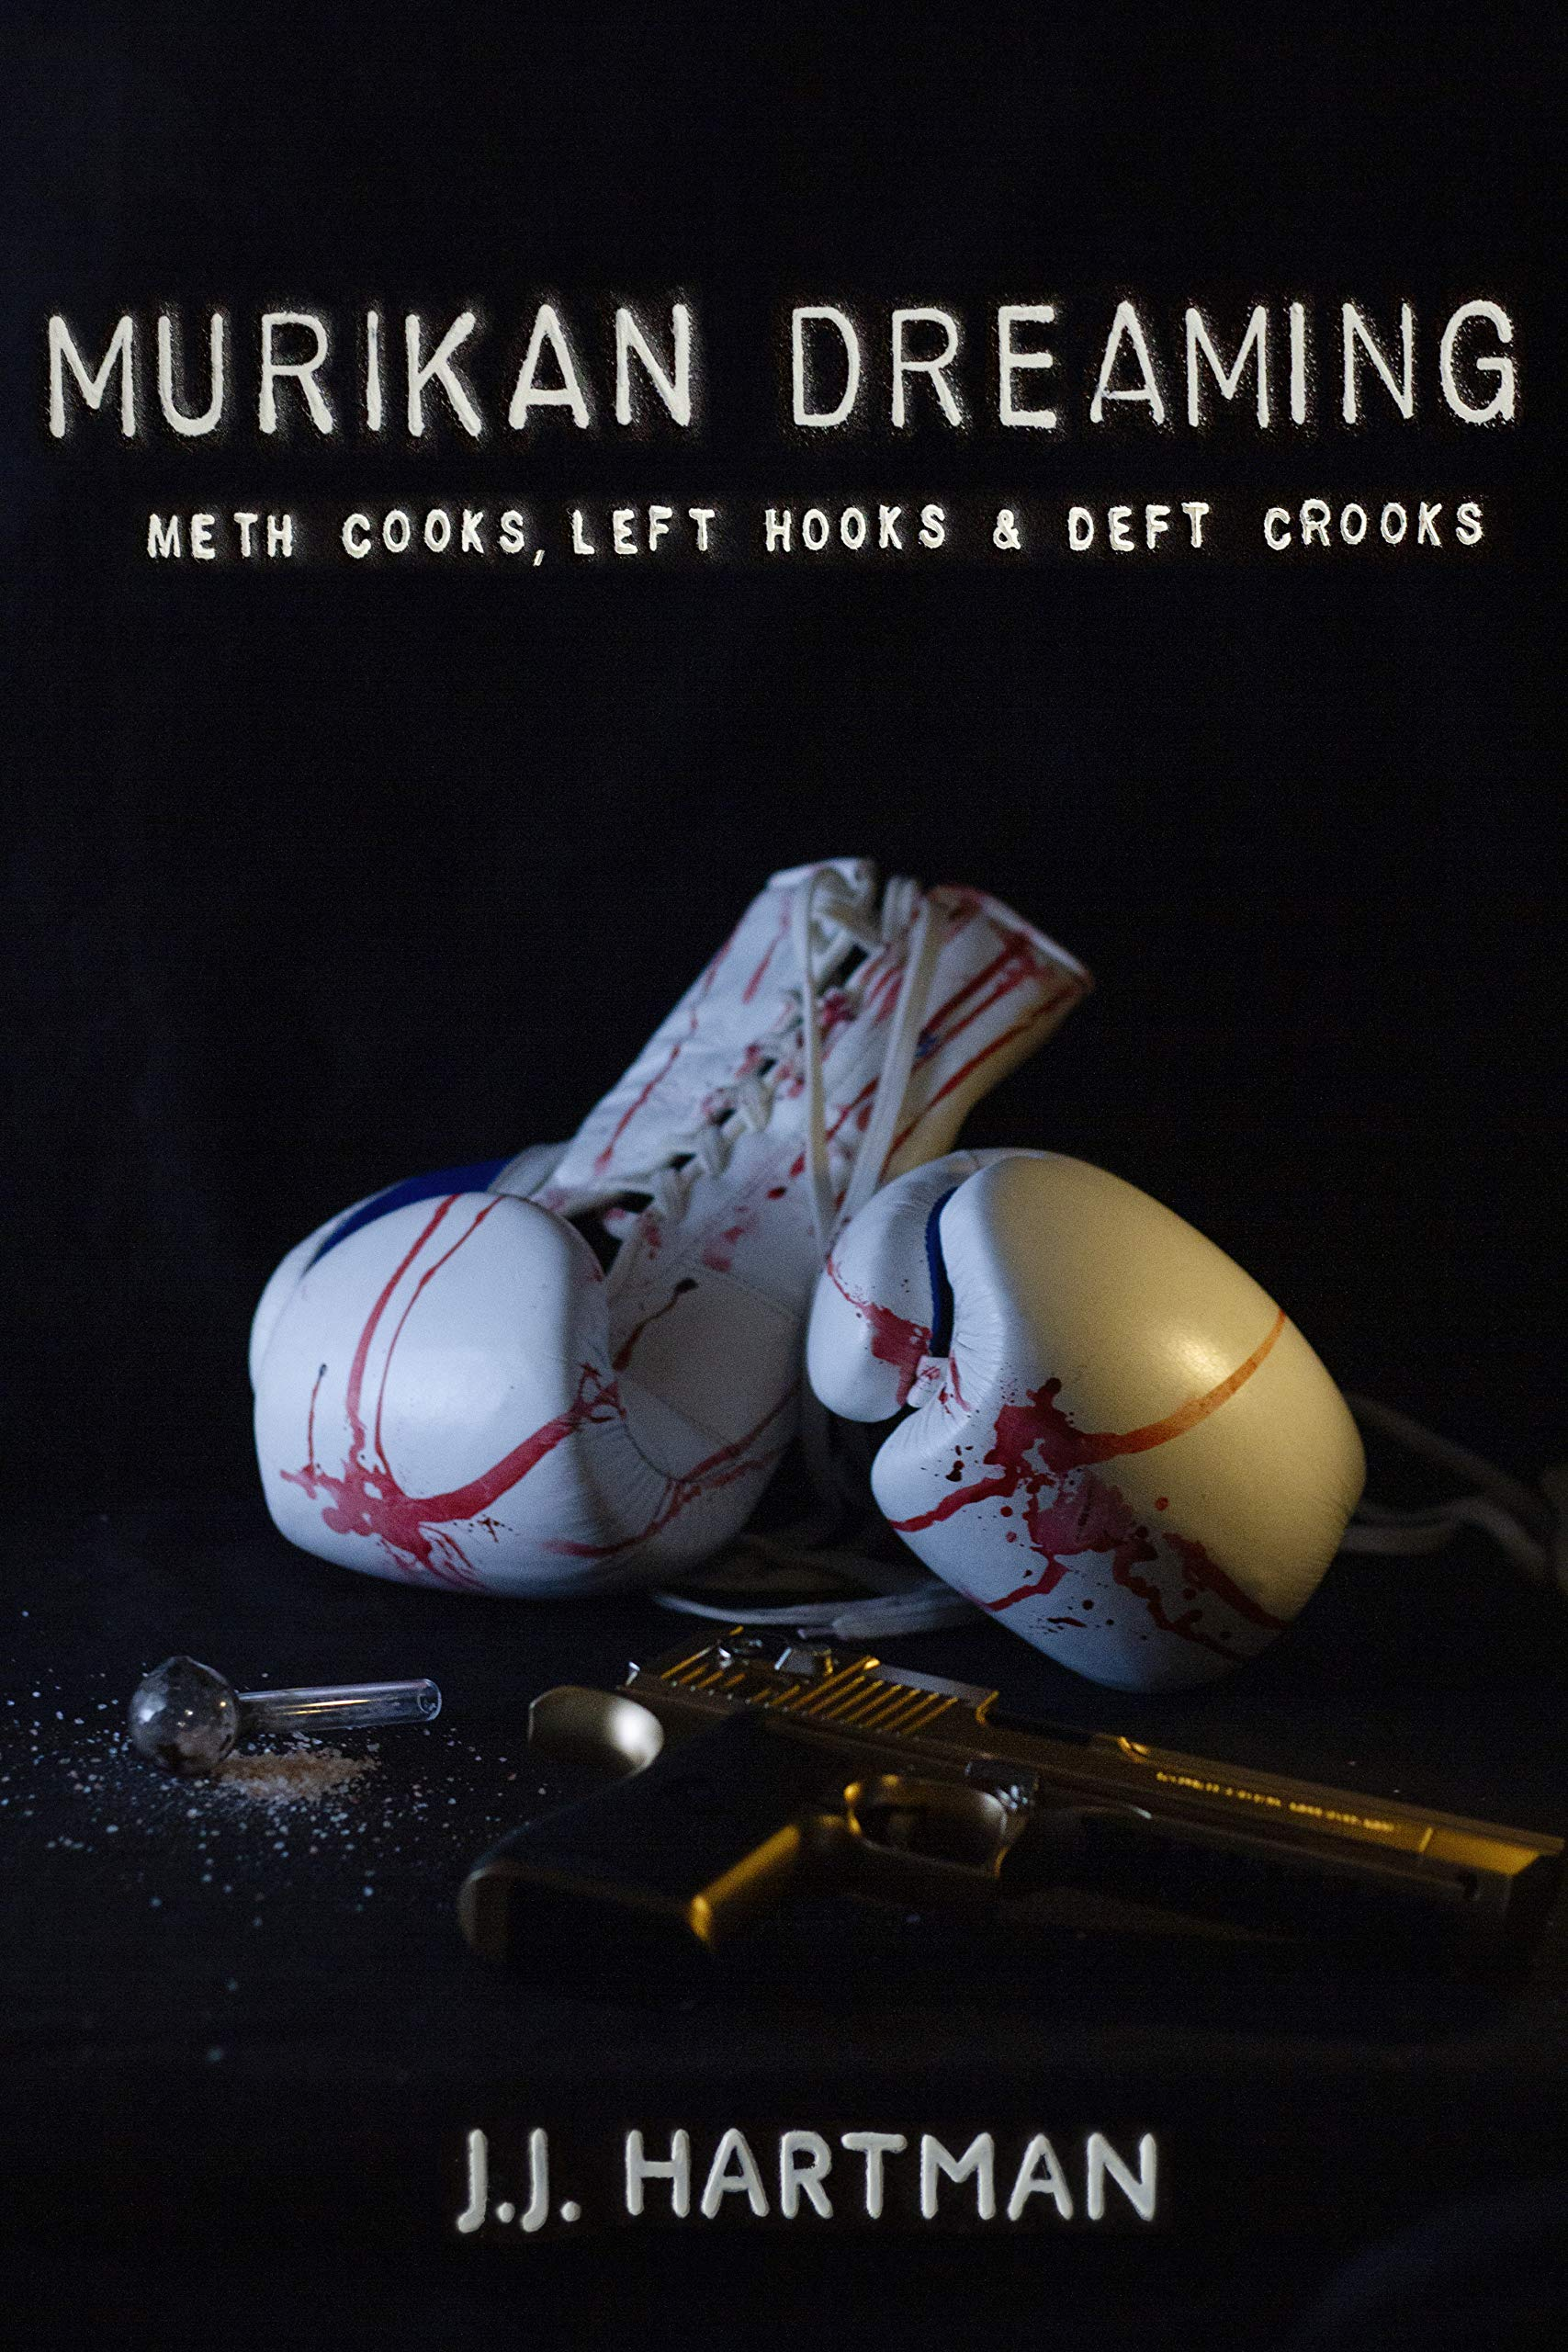 MURIKAN DREAMING: Meth Cooks, Left Hooks and Deft Crooks